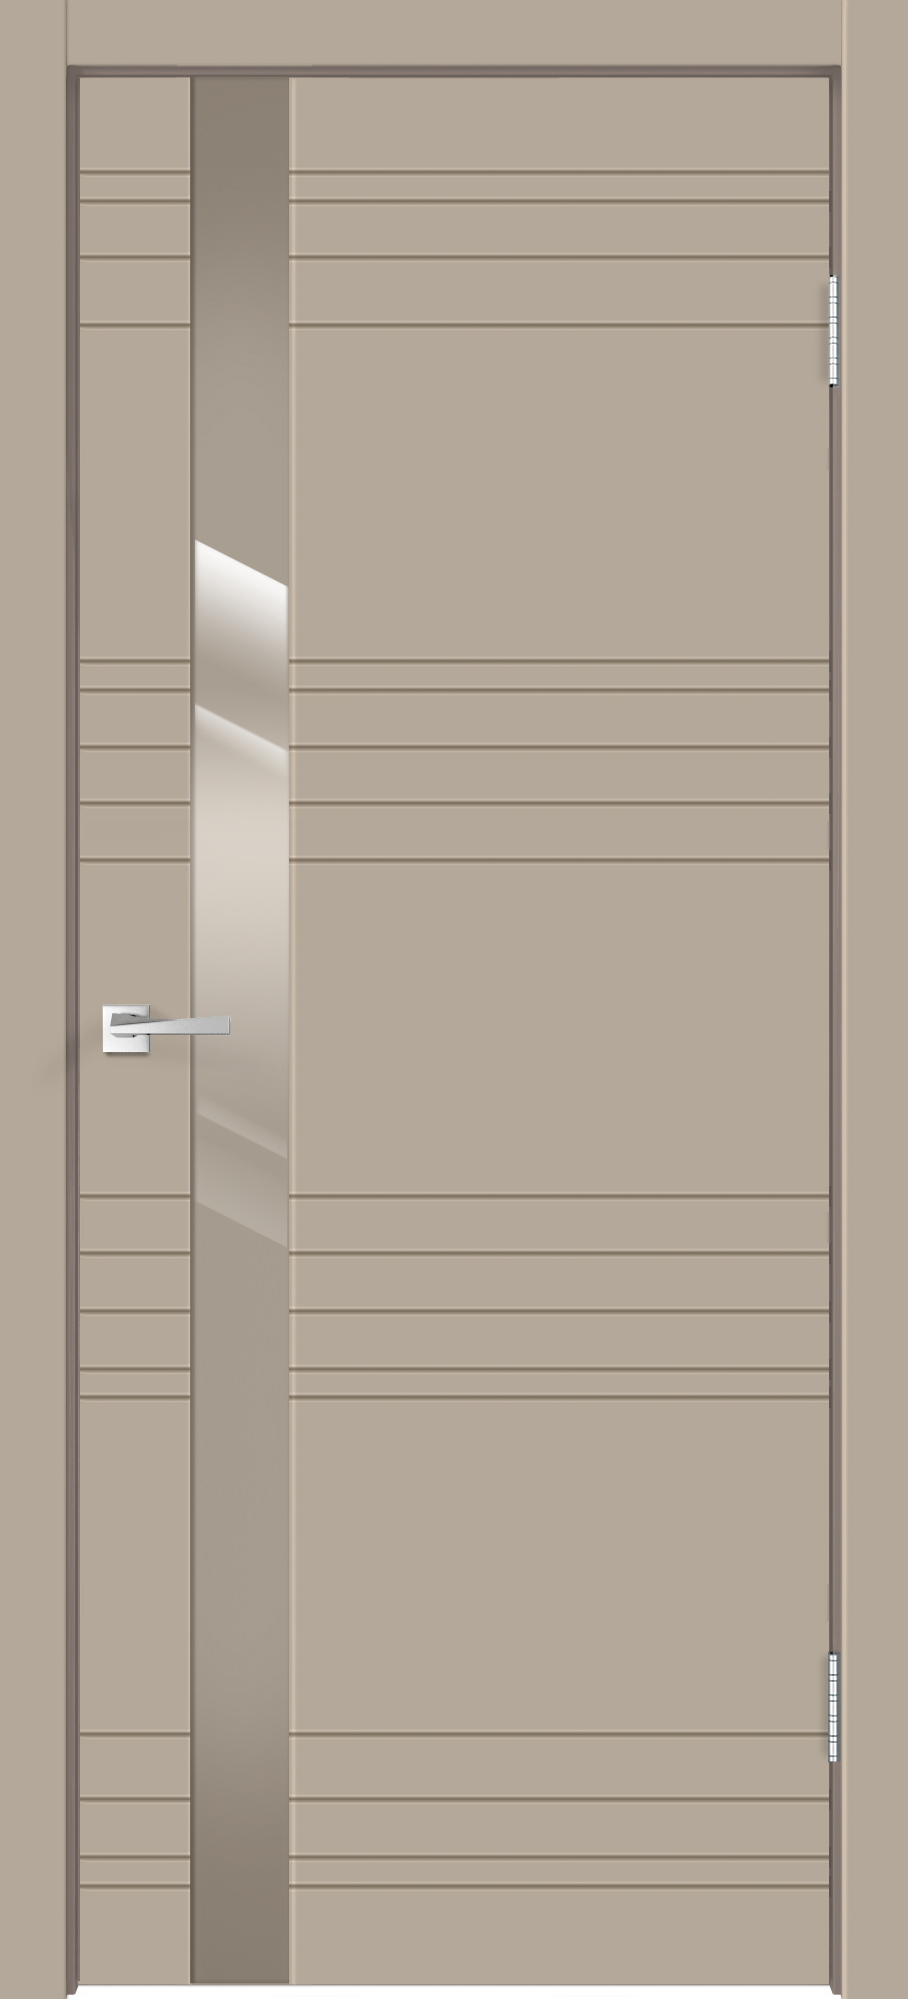 Двери SCANDI N Z1 - Цветное стекло глянец